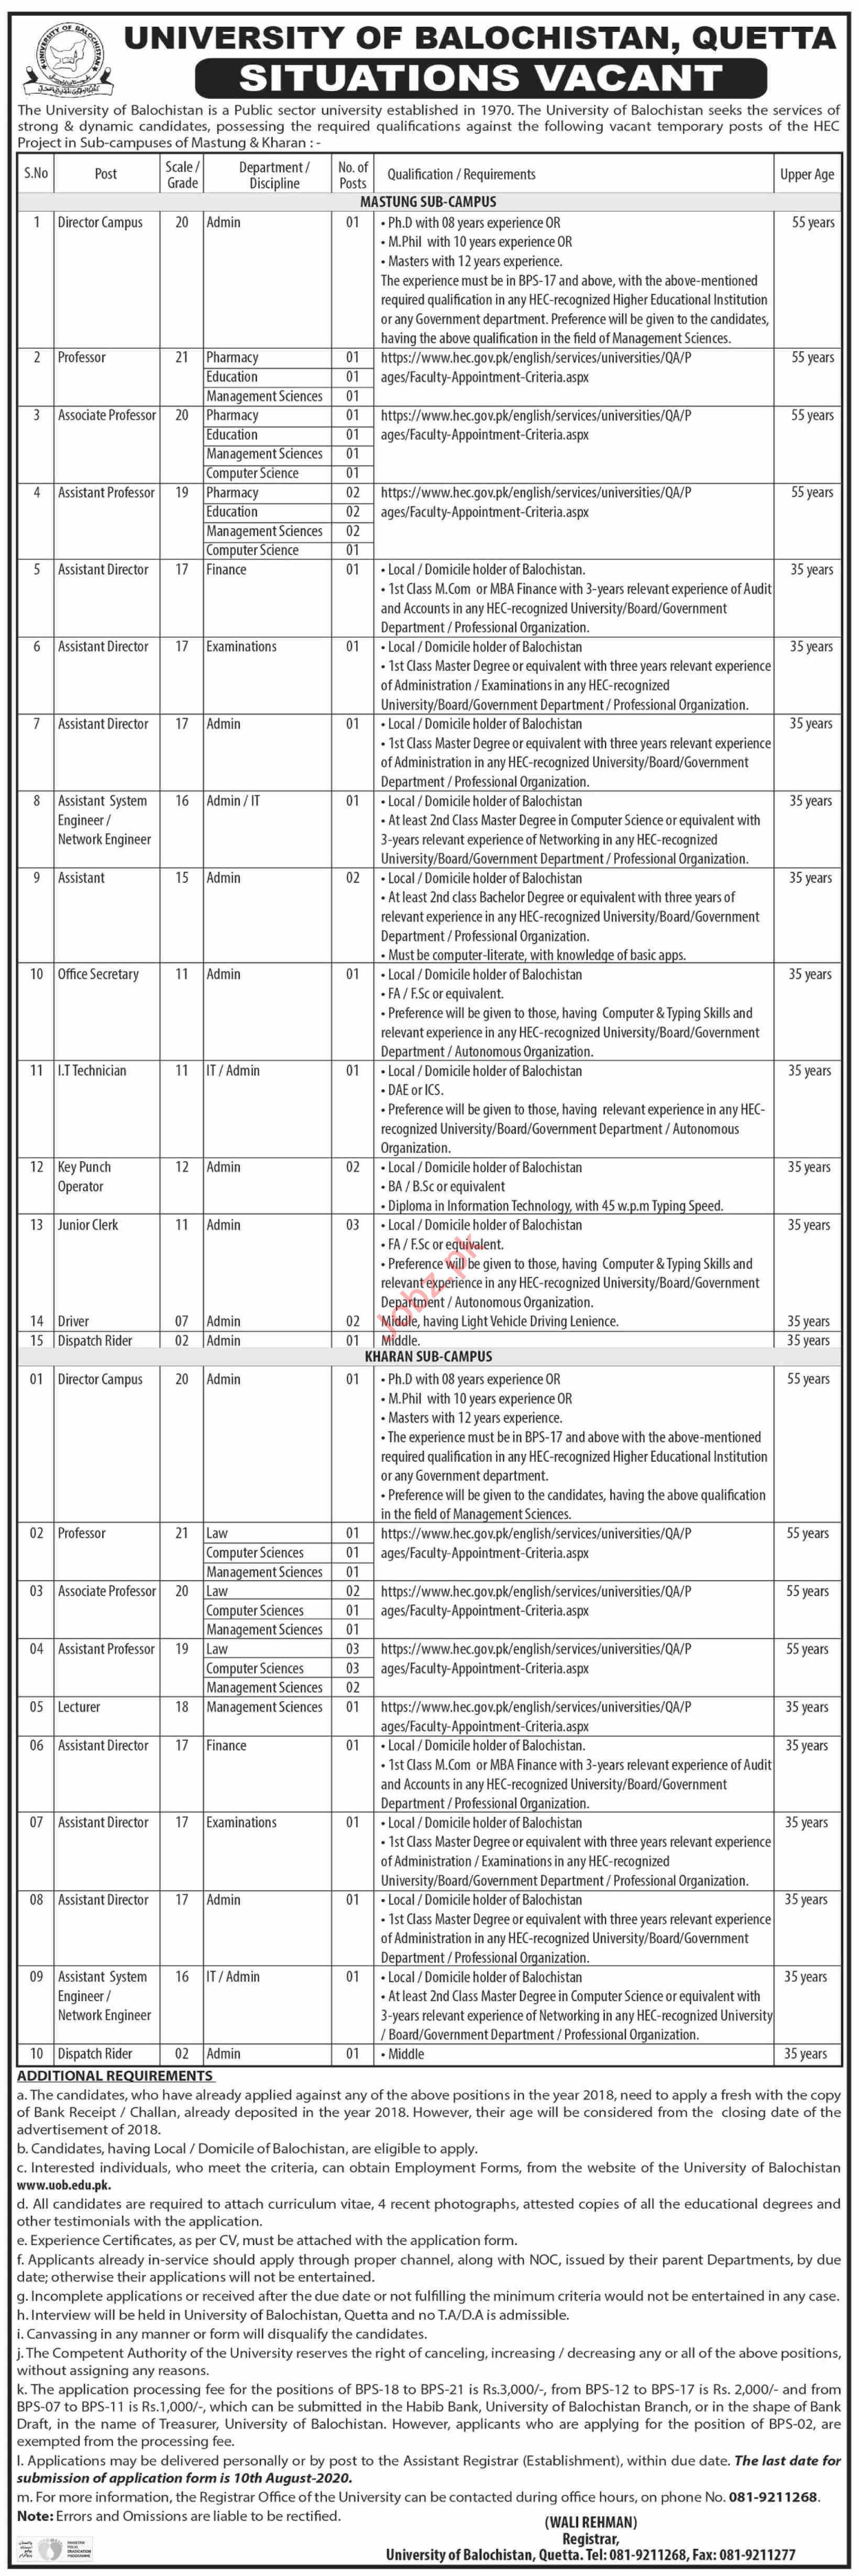 University of Balochistan UOB Quetta Jobs 2020 or Professors